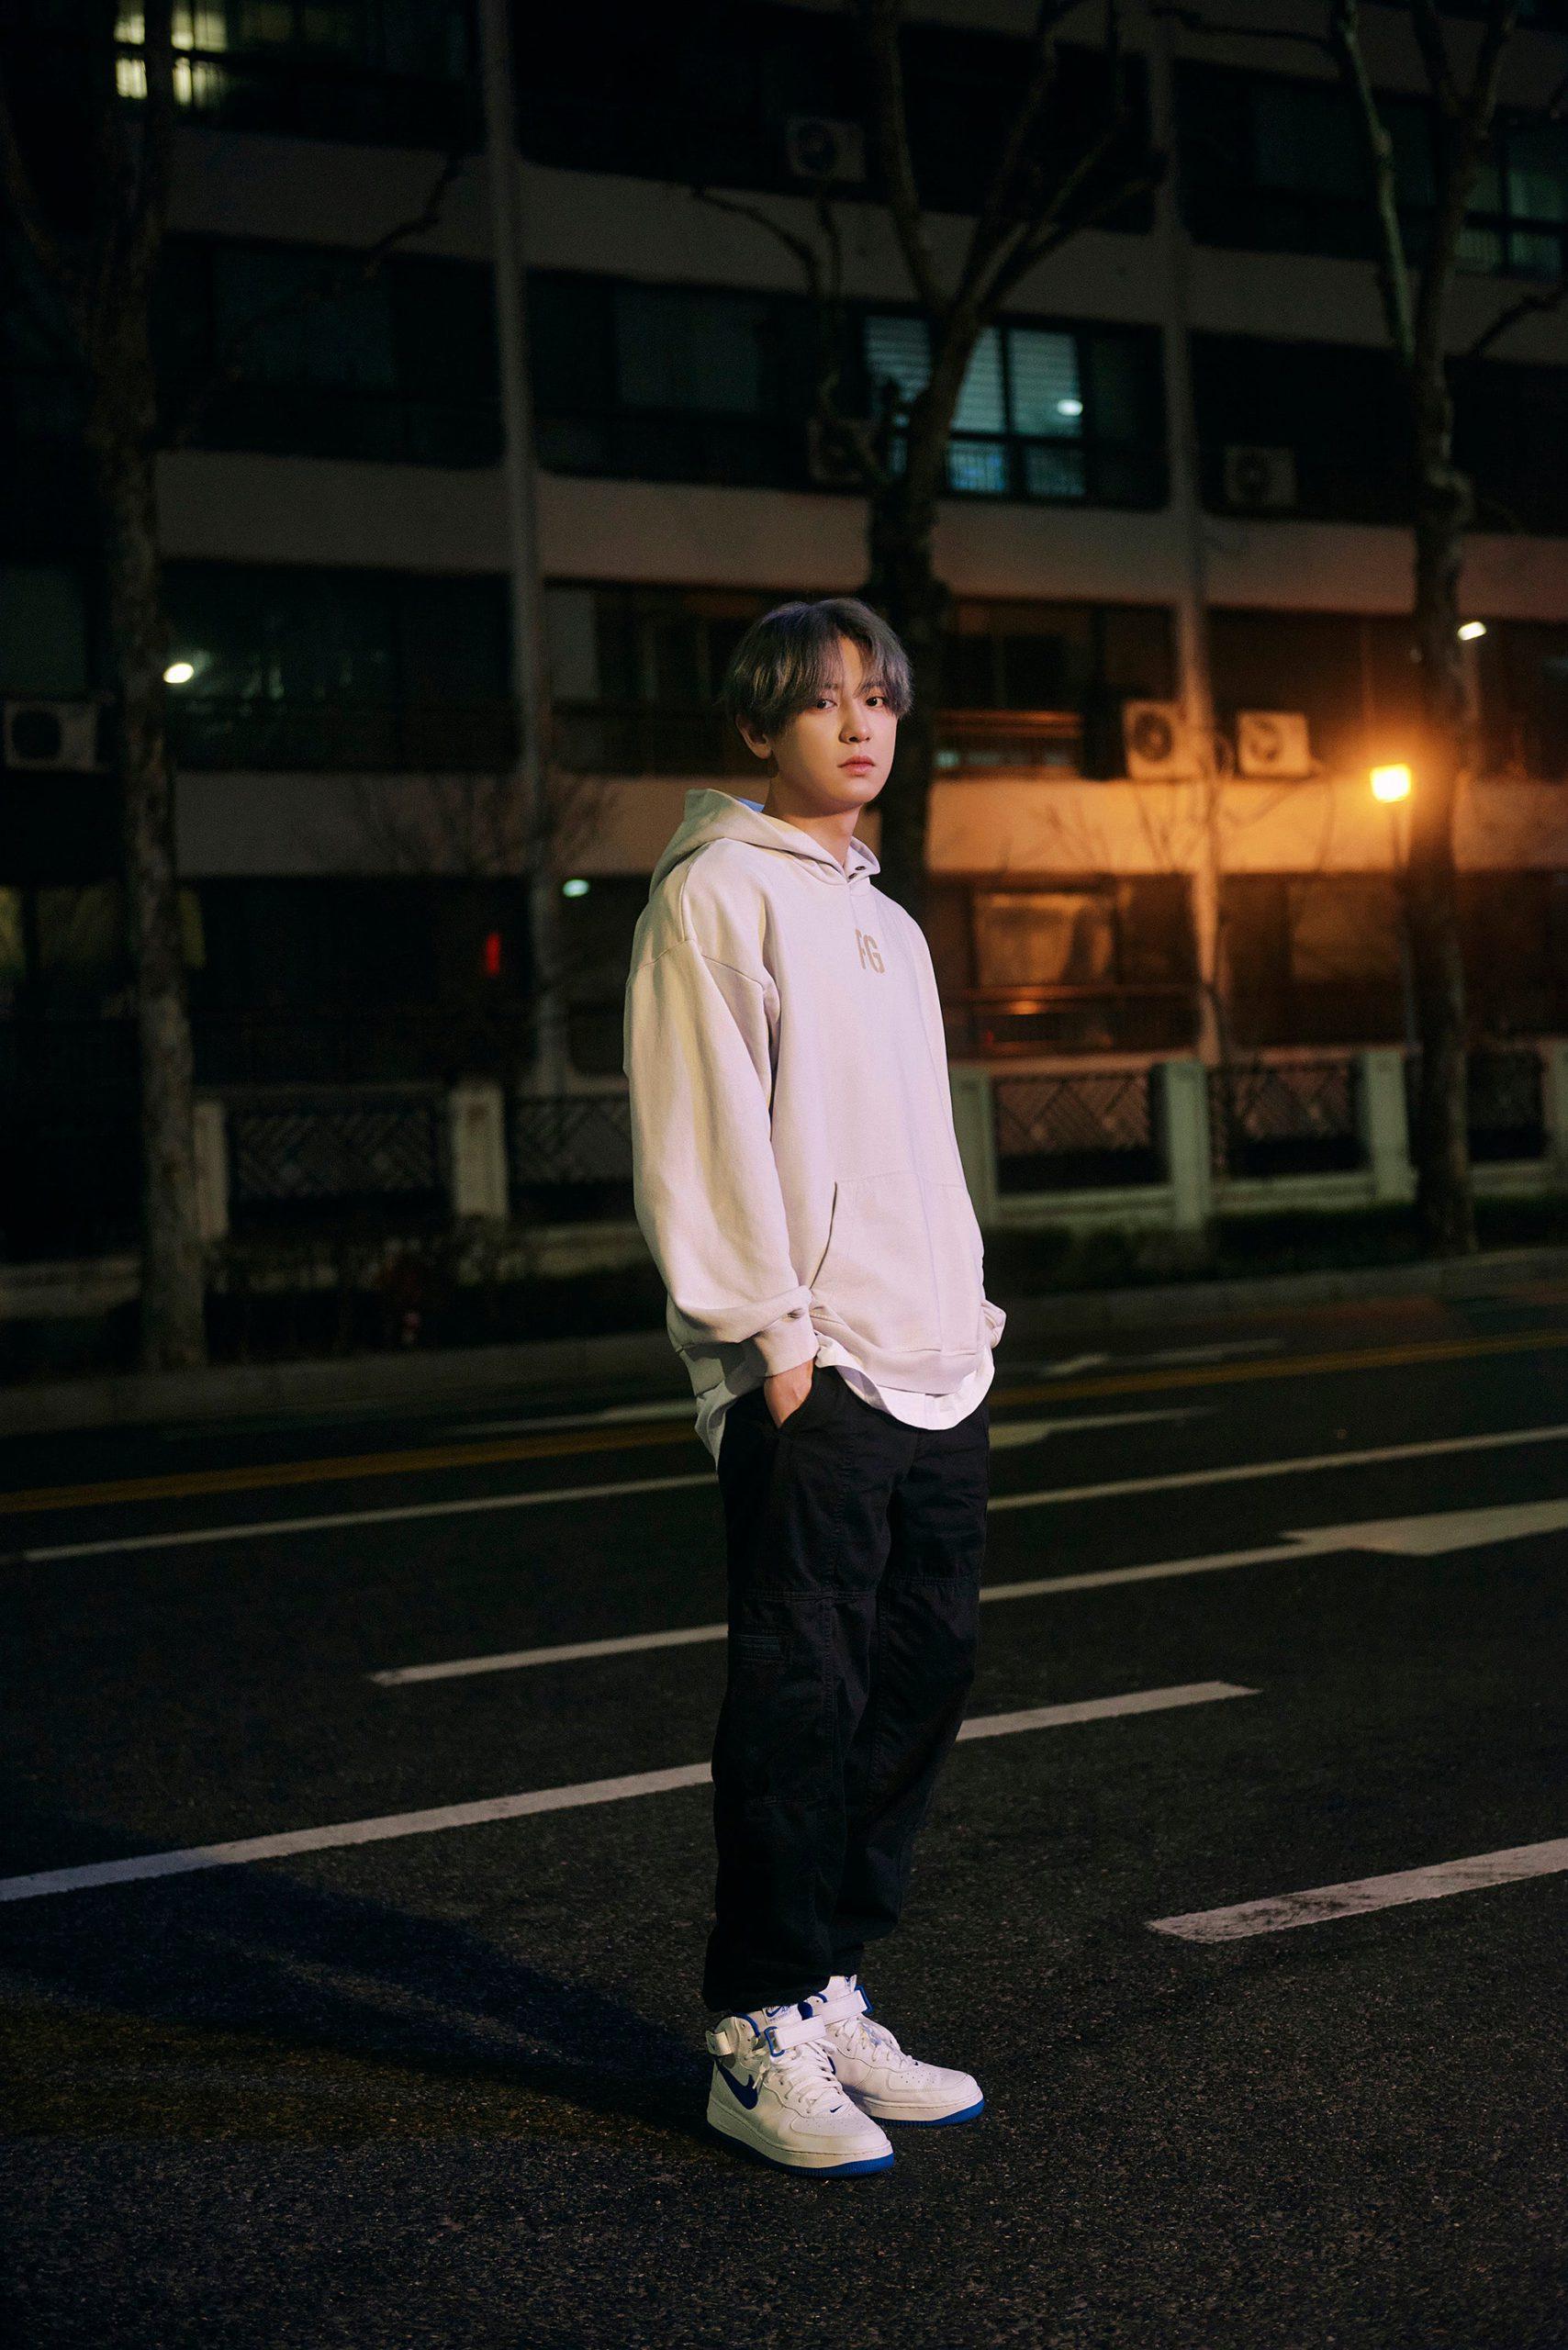 Chanyeol de EXO comparte fotosteaser para 'Tomorrow' deSM STATION